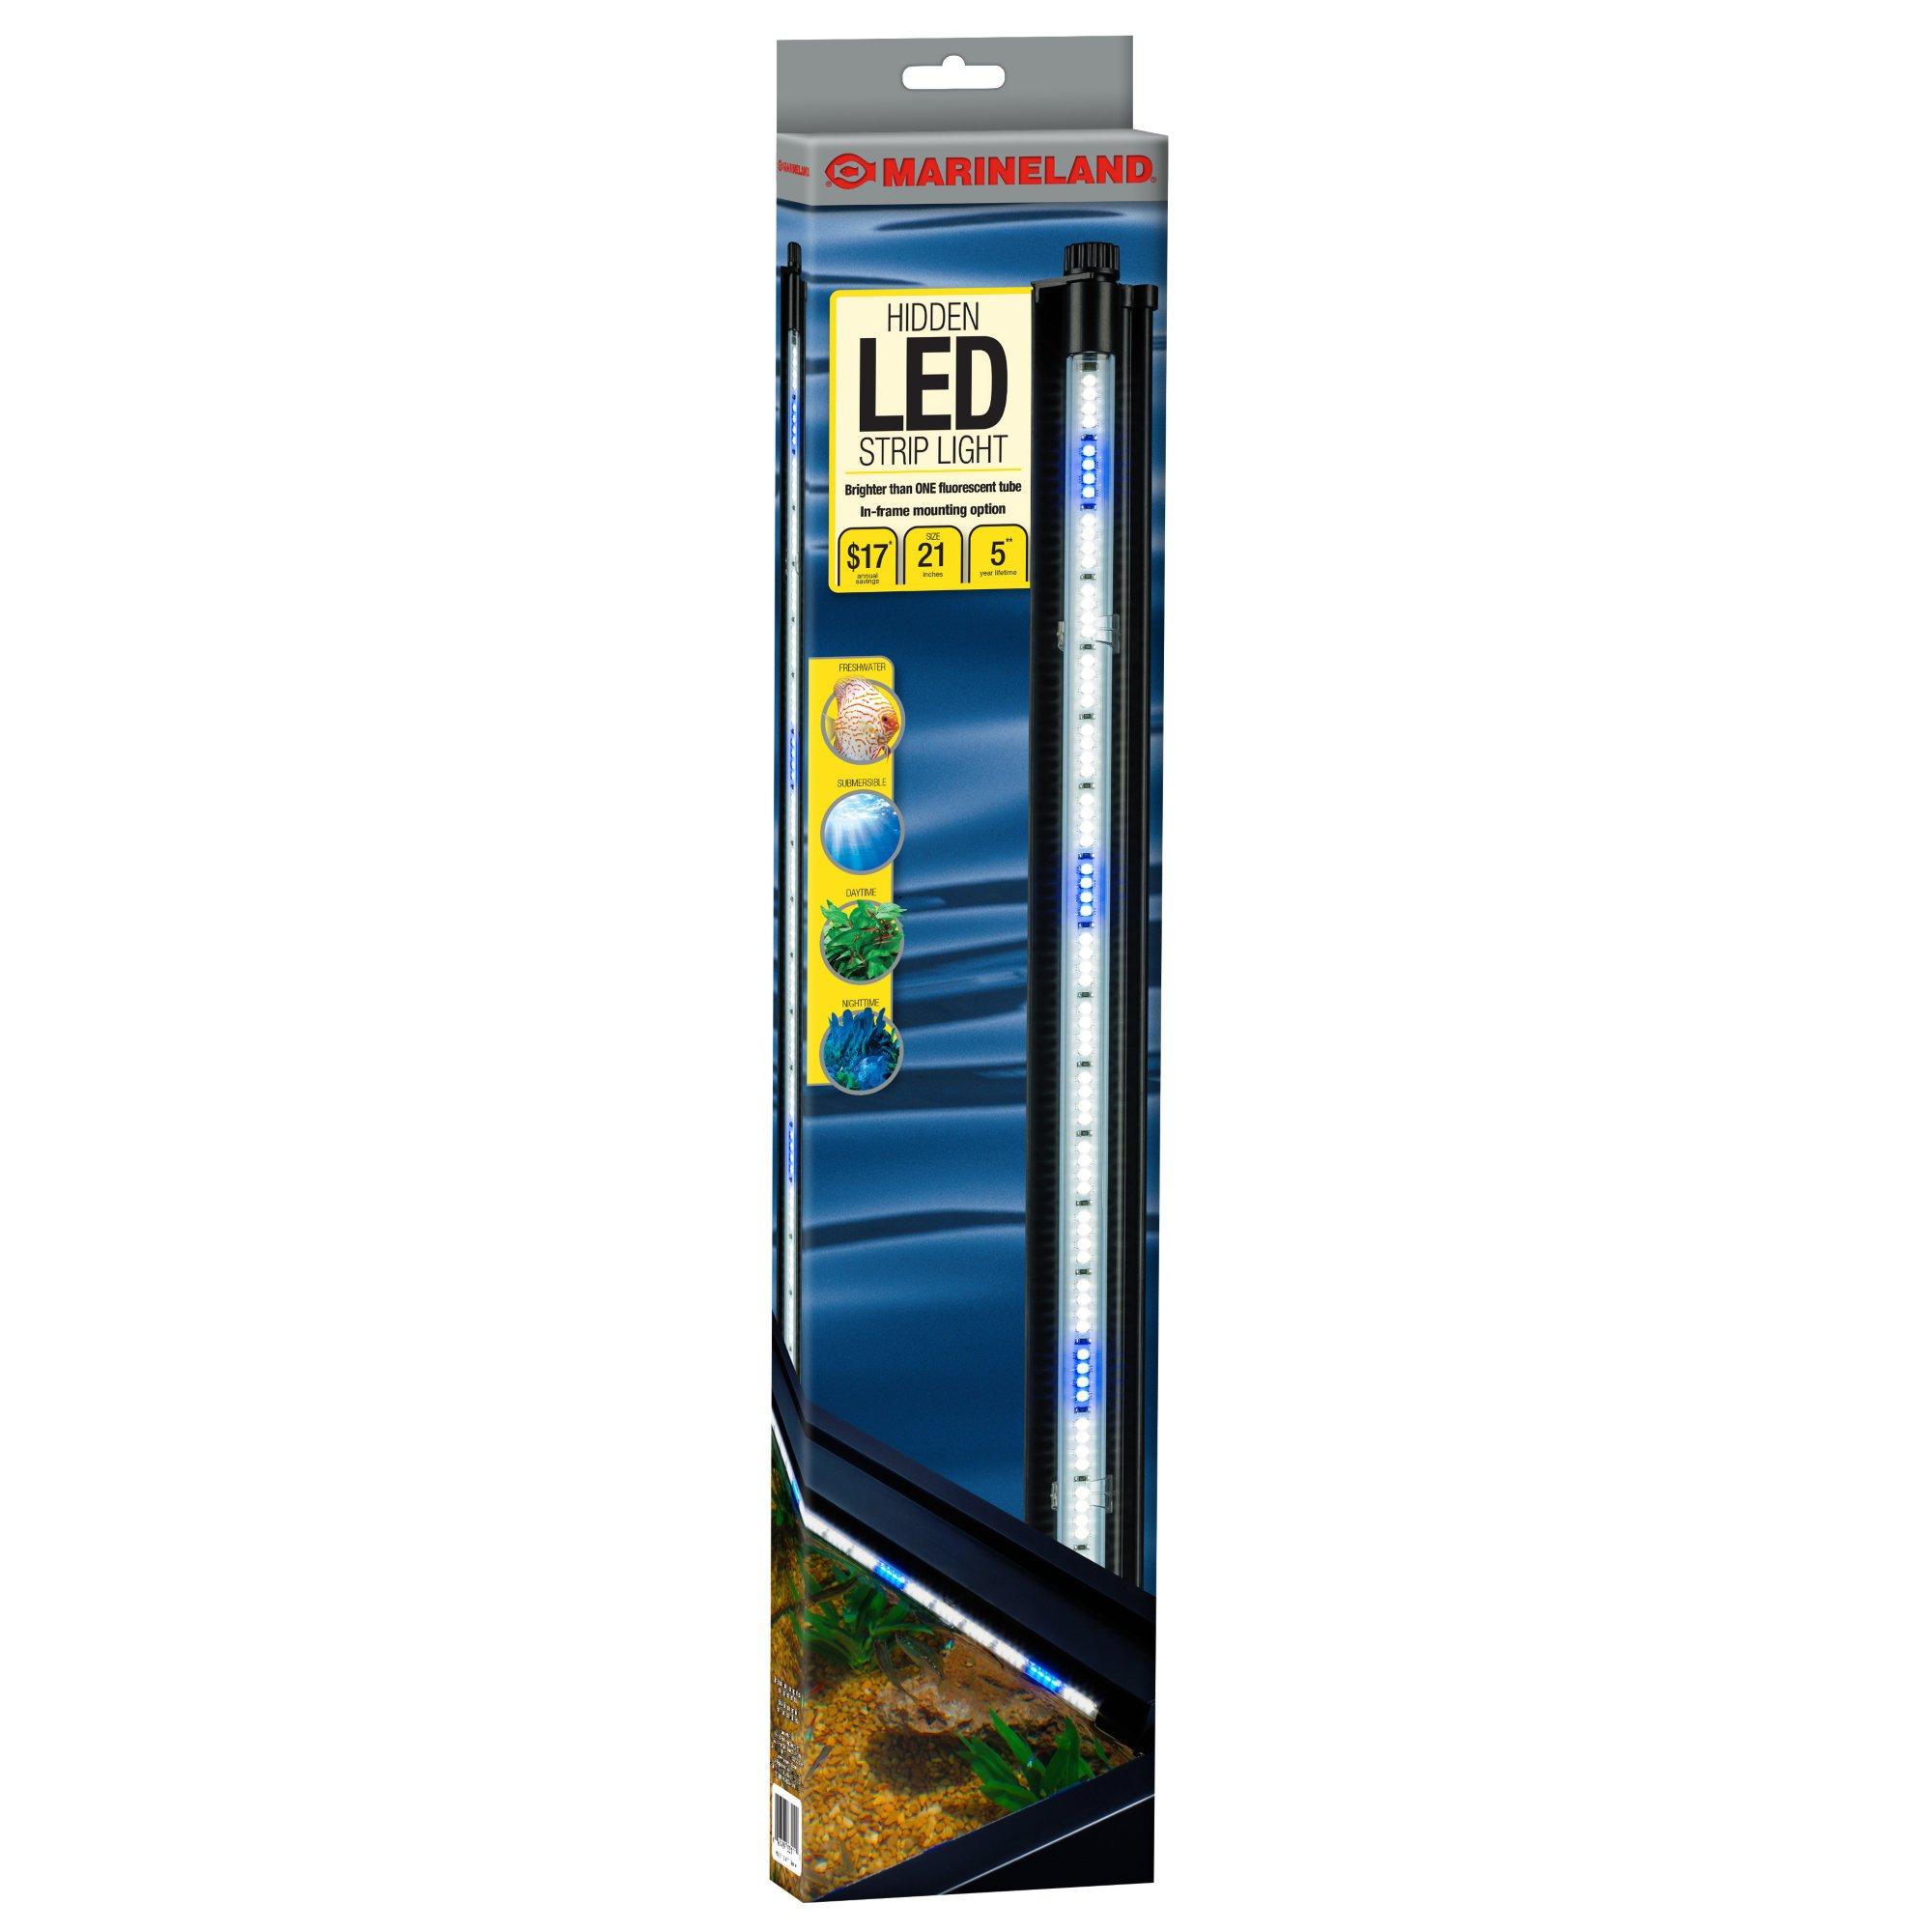 "Using Shop Lights For Aquarium: Marineland Hidden LED Lighting System 21"""